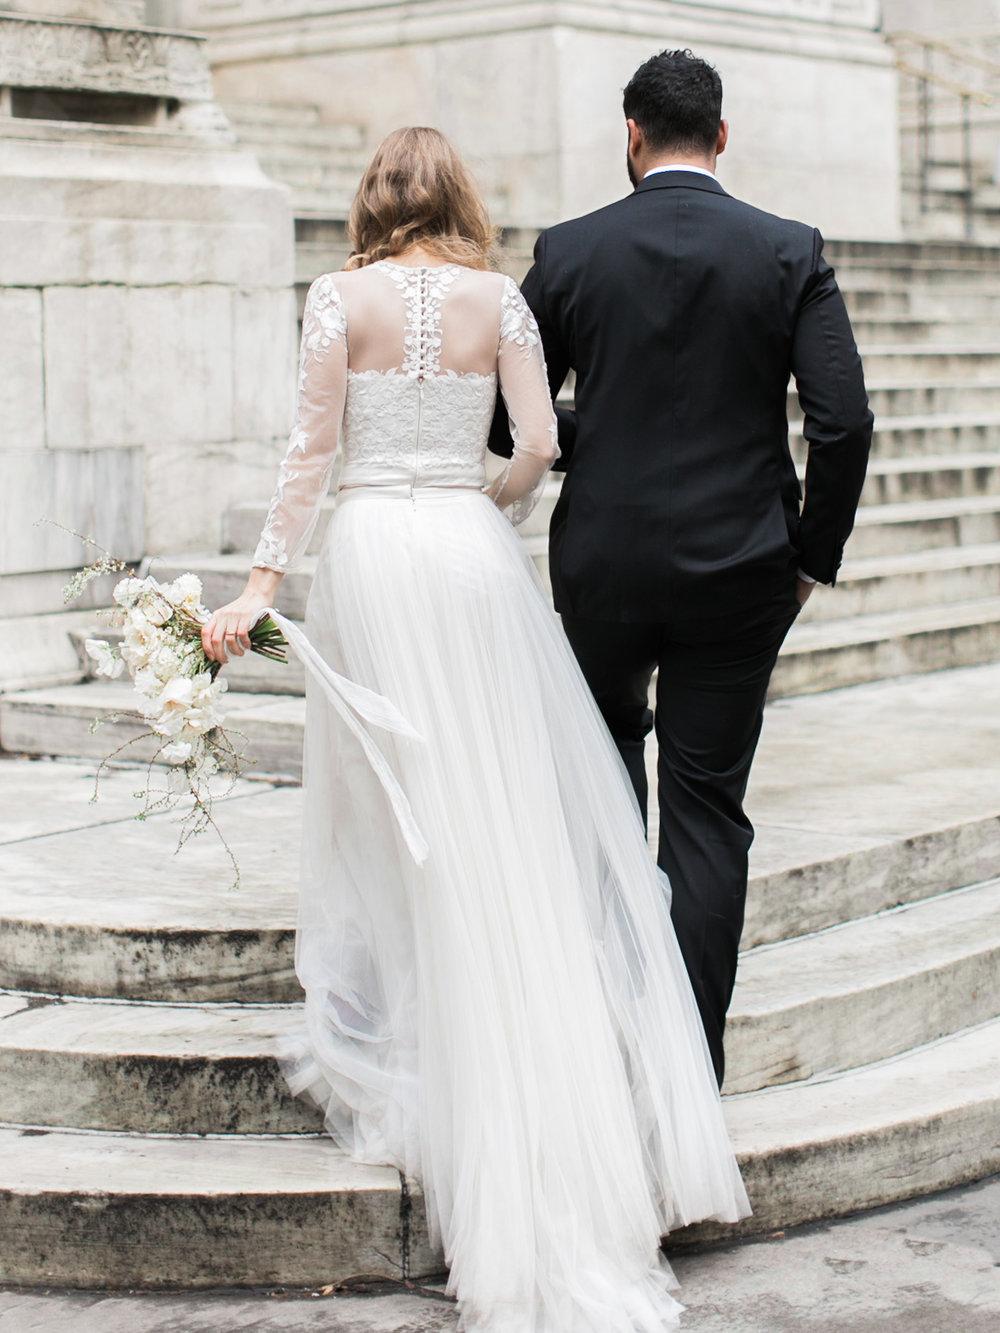 asher-gardner-photography-bryant-park-wedding-00206.jpg